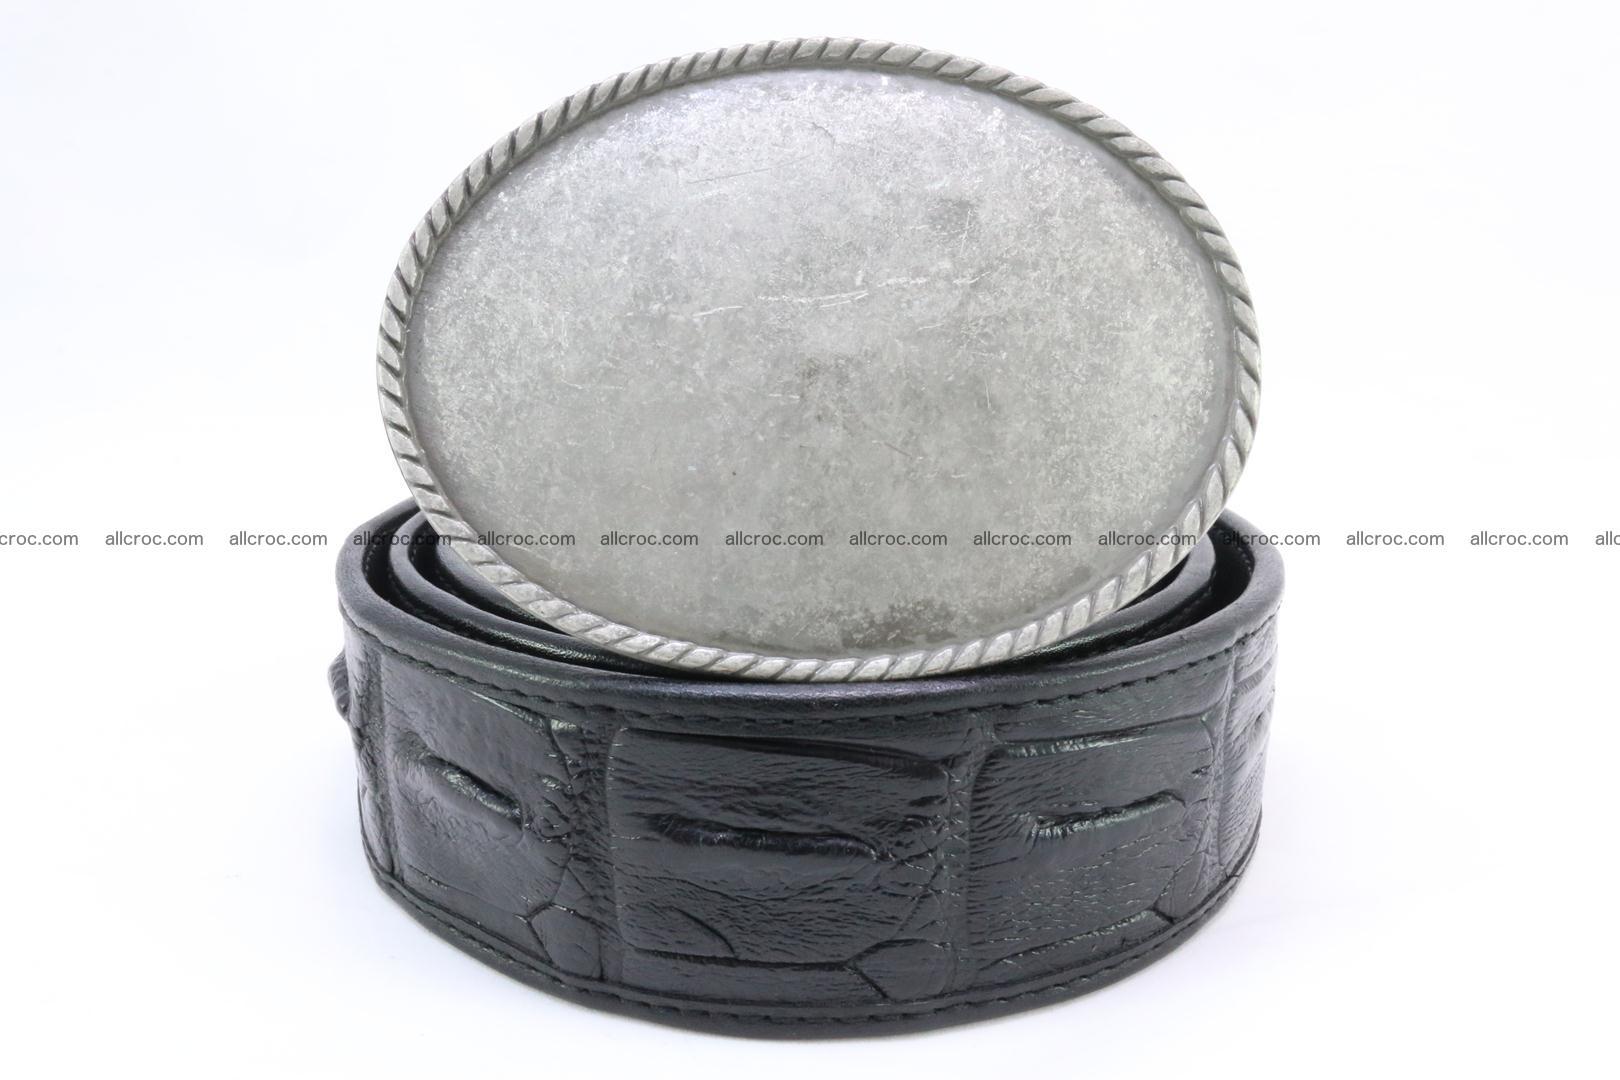 Genuine crocodile leather hornback belt 067 Foto 1